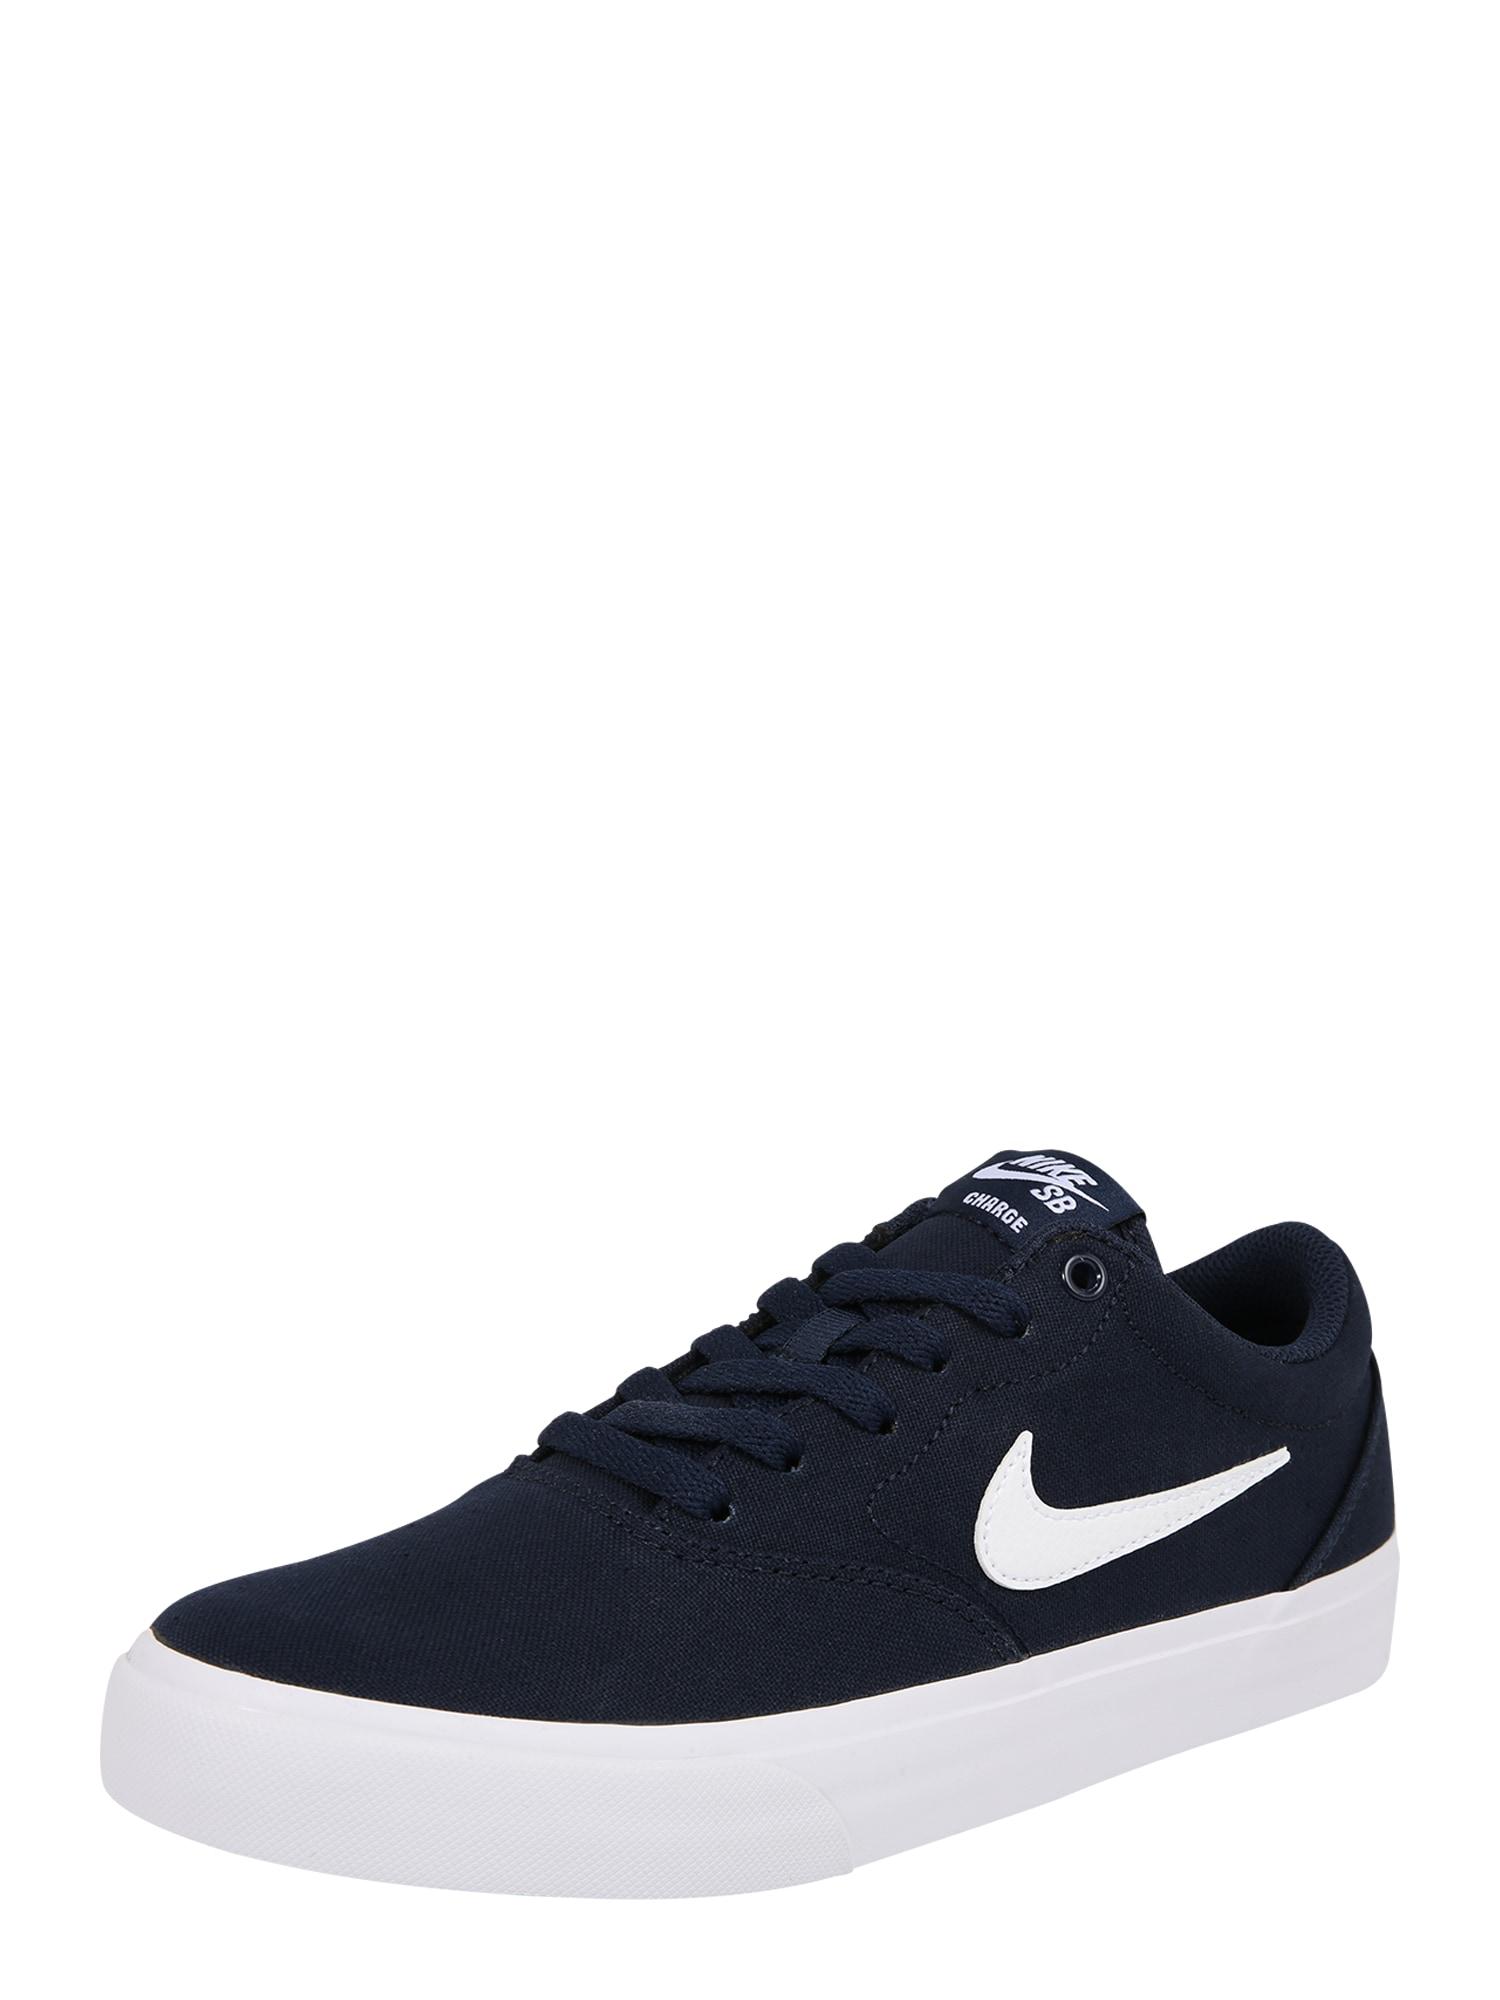 Tenisky Charge černá bílá Nike SB